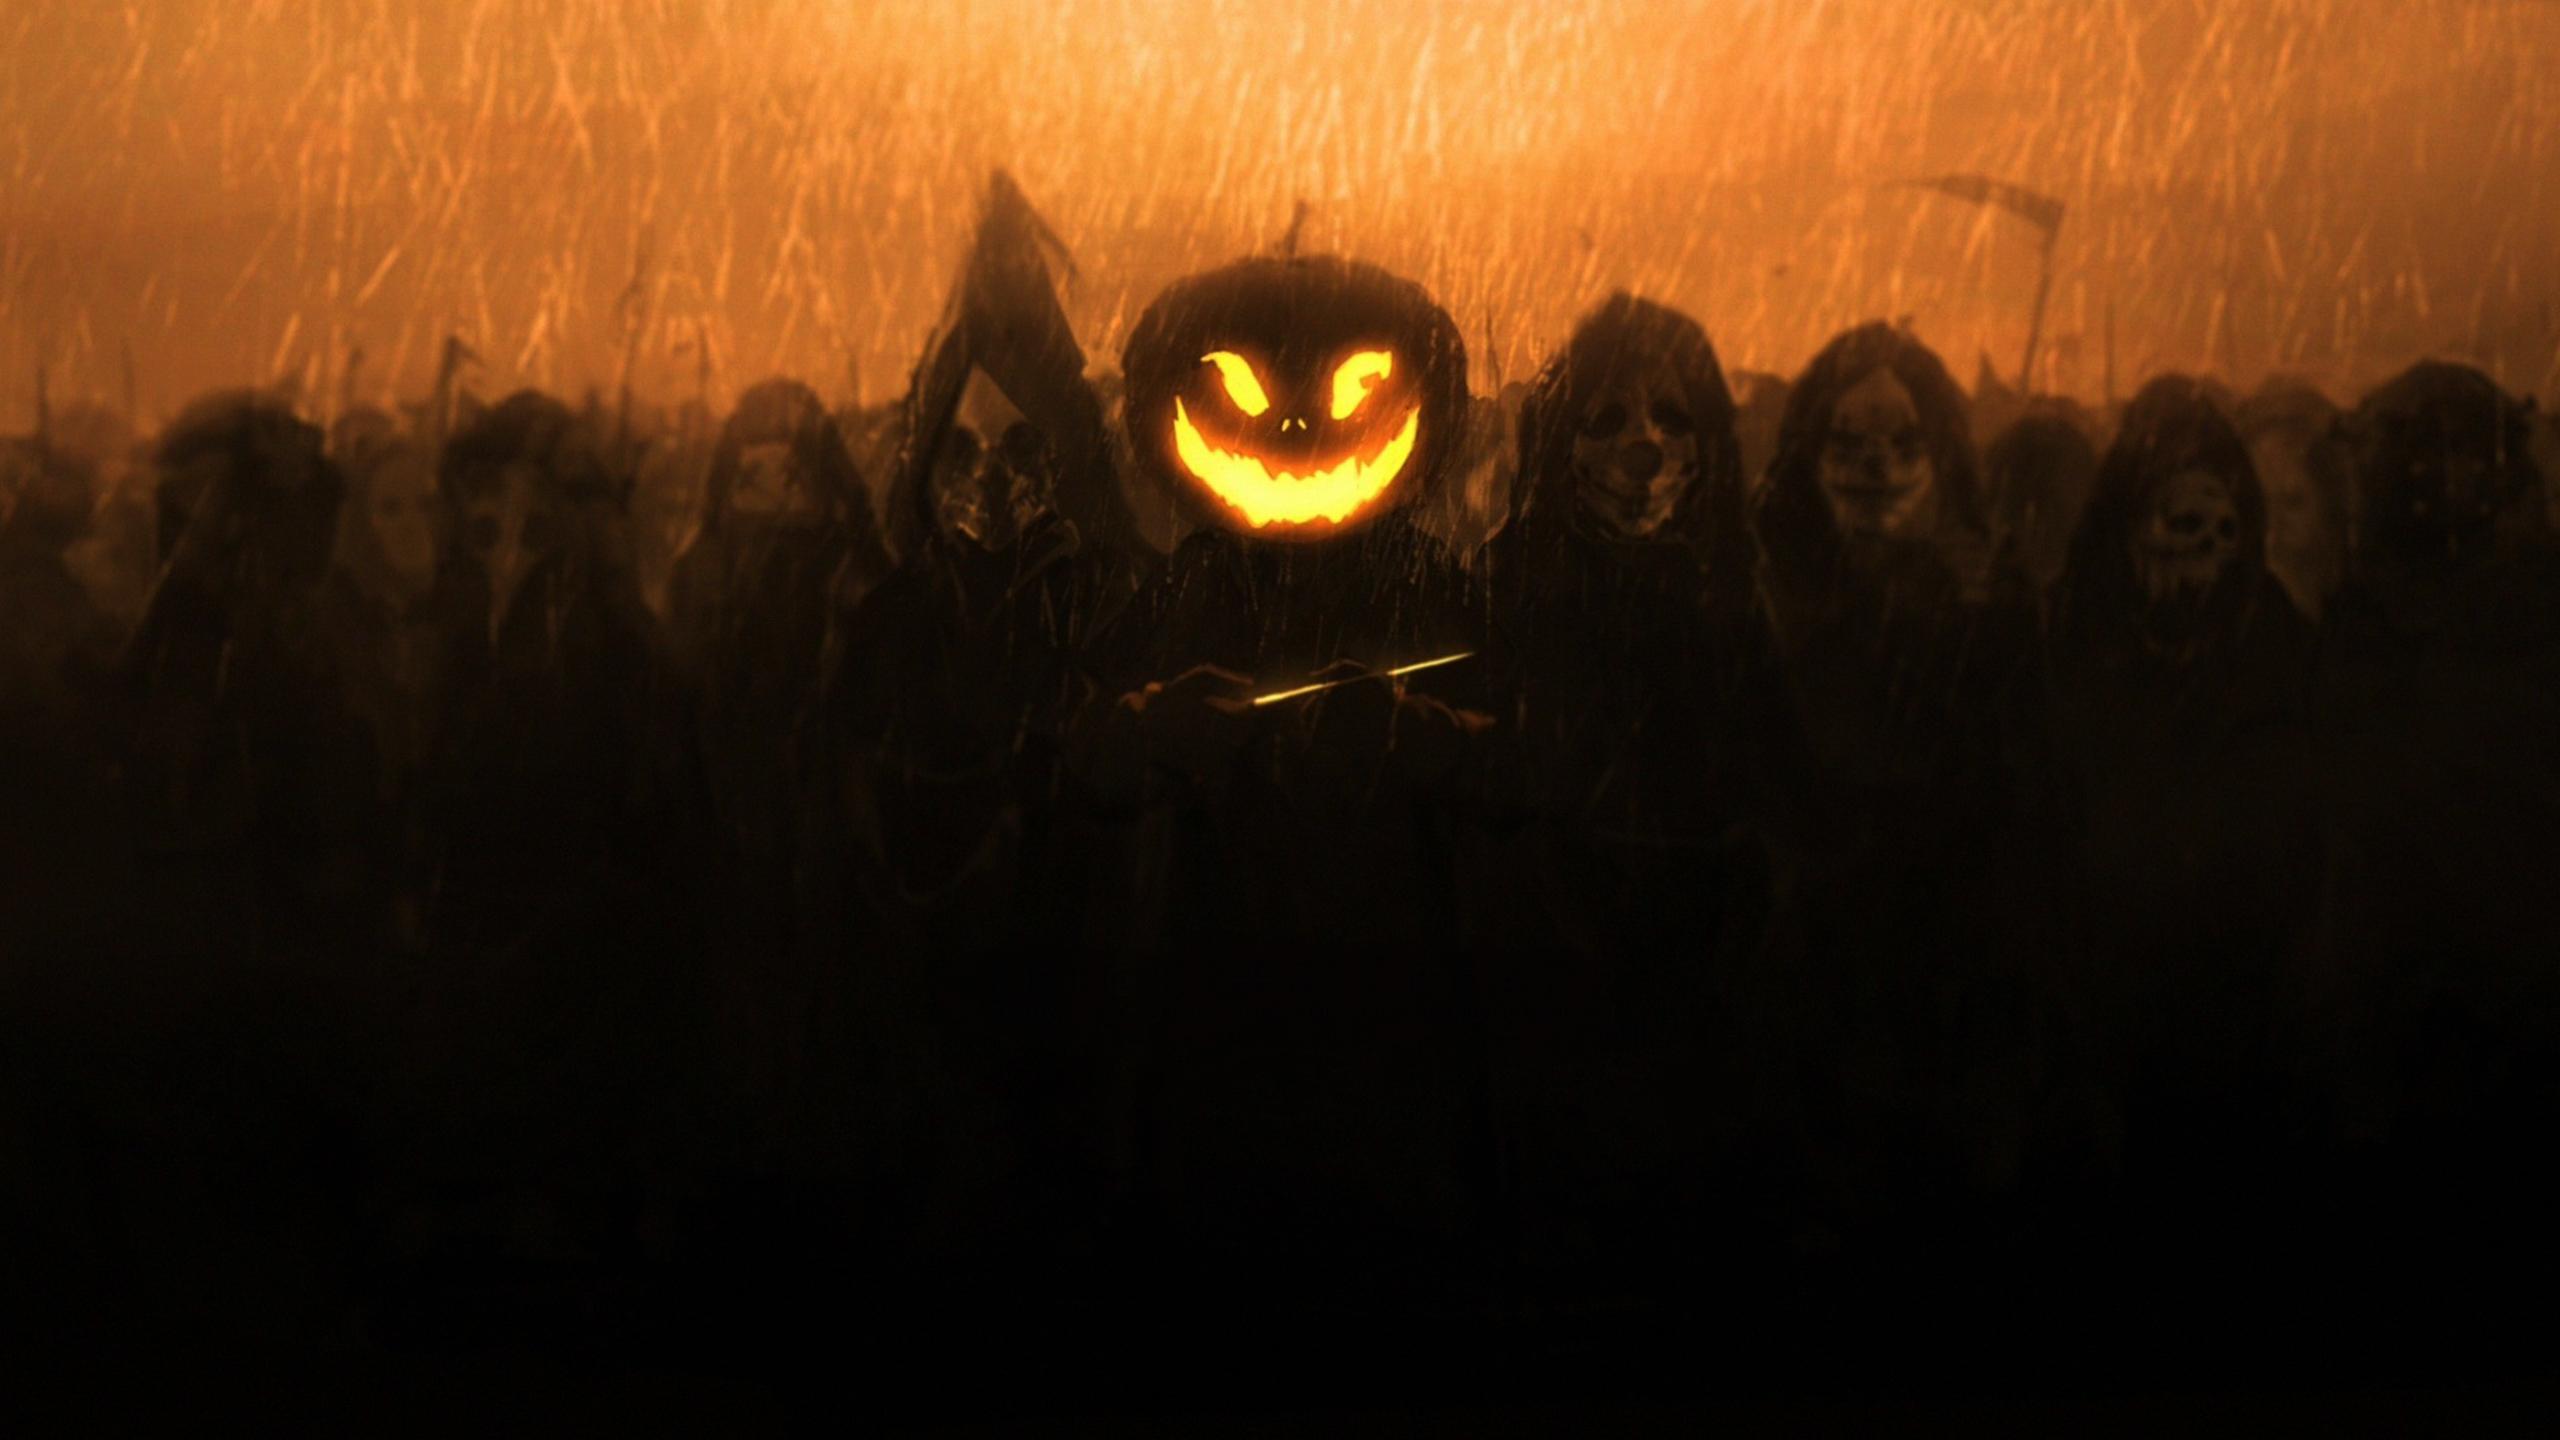 Halloween Spooky Wallpaper.Wallpaper Halloween Spooky Digital Art Installation